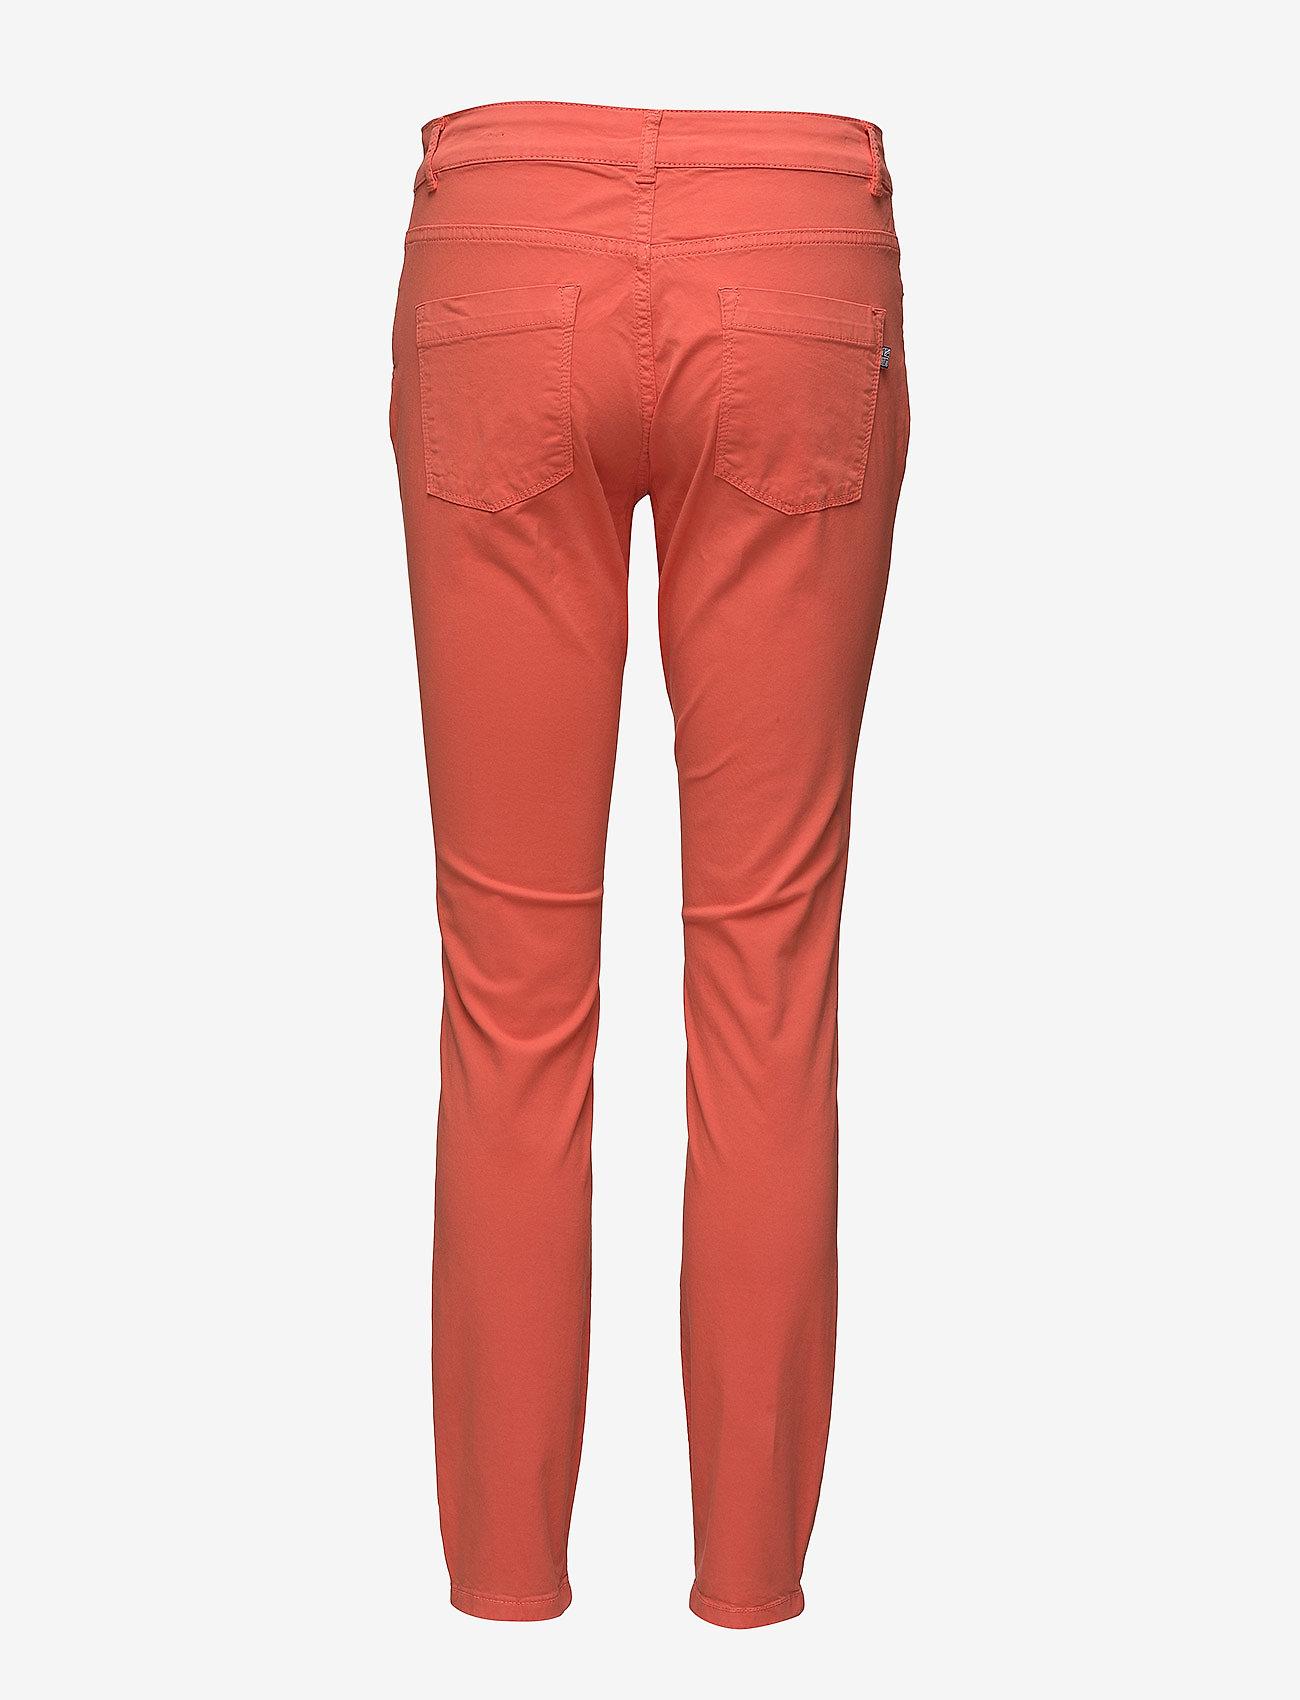 Park Lane - Hayley twill - spodnie rurki - 419 coral - 1